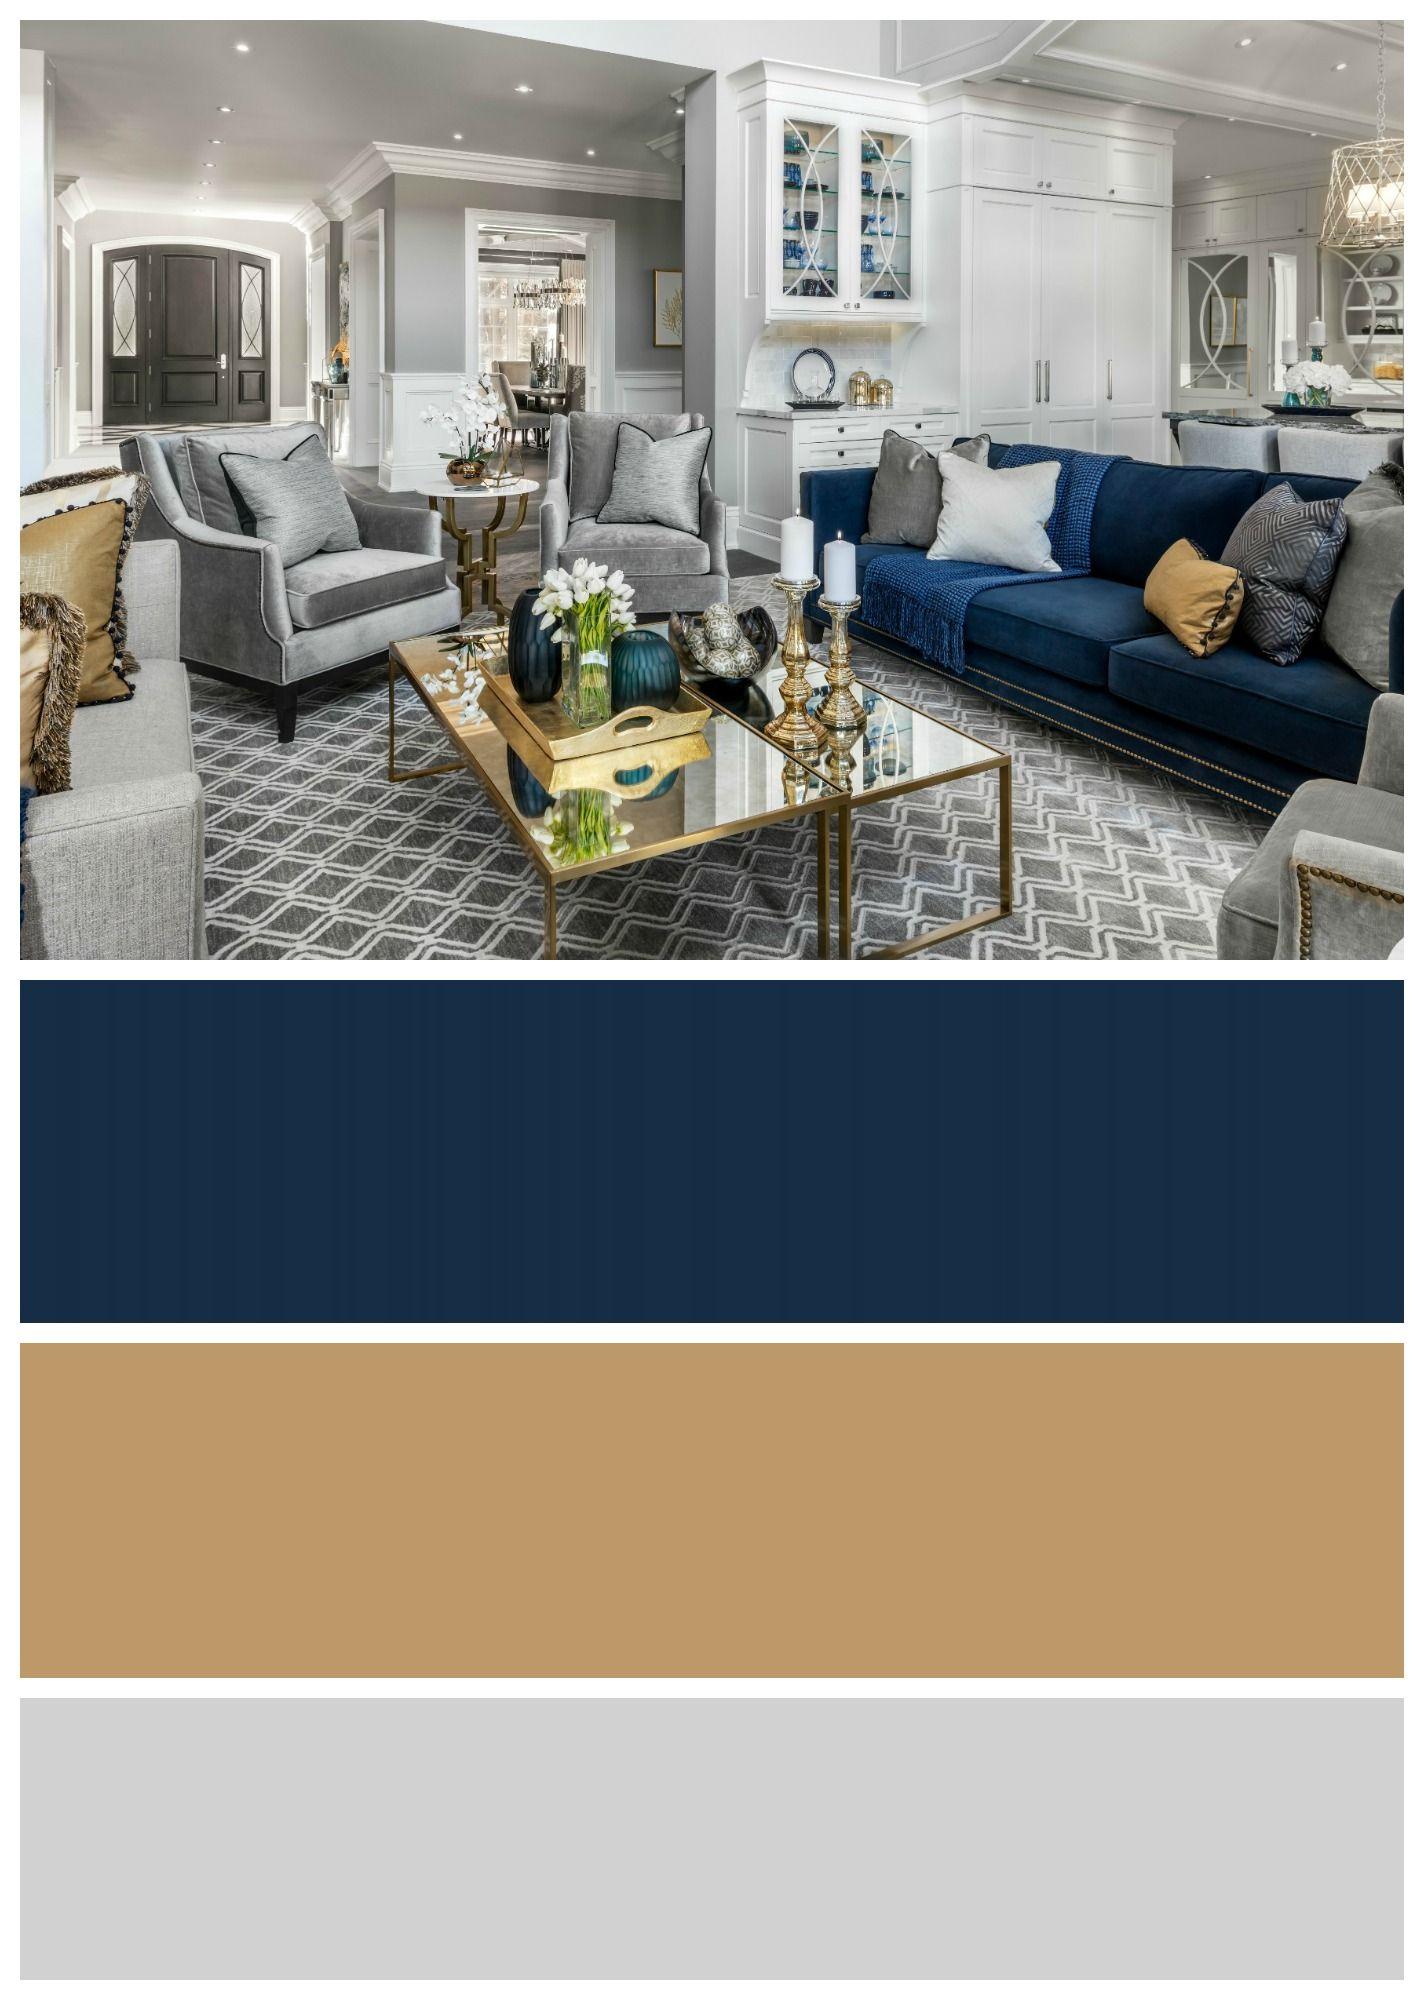 Scott Mcgillivray's Living Room Color Scheme  Decor  Pinterest Interesting Color Scheme Living Room Design Ideas